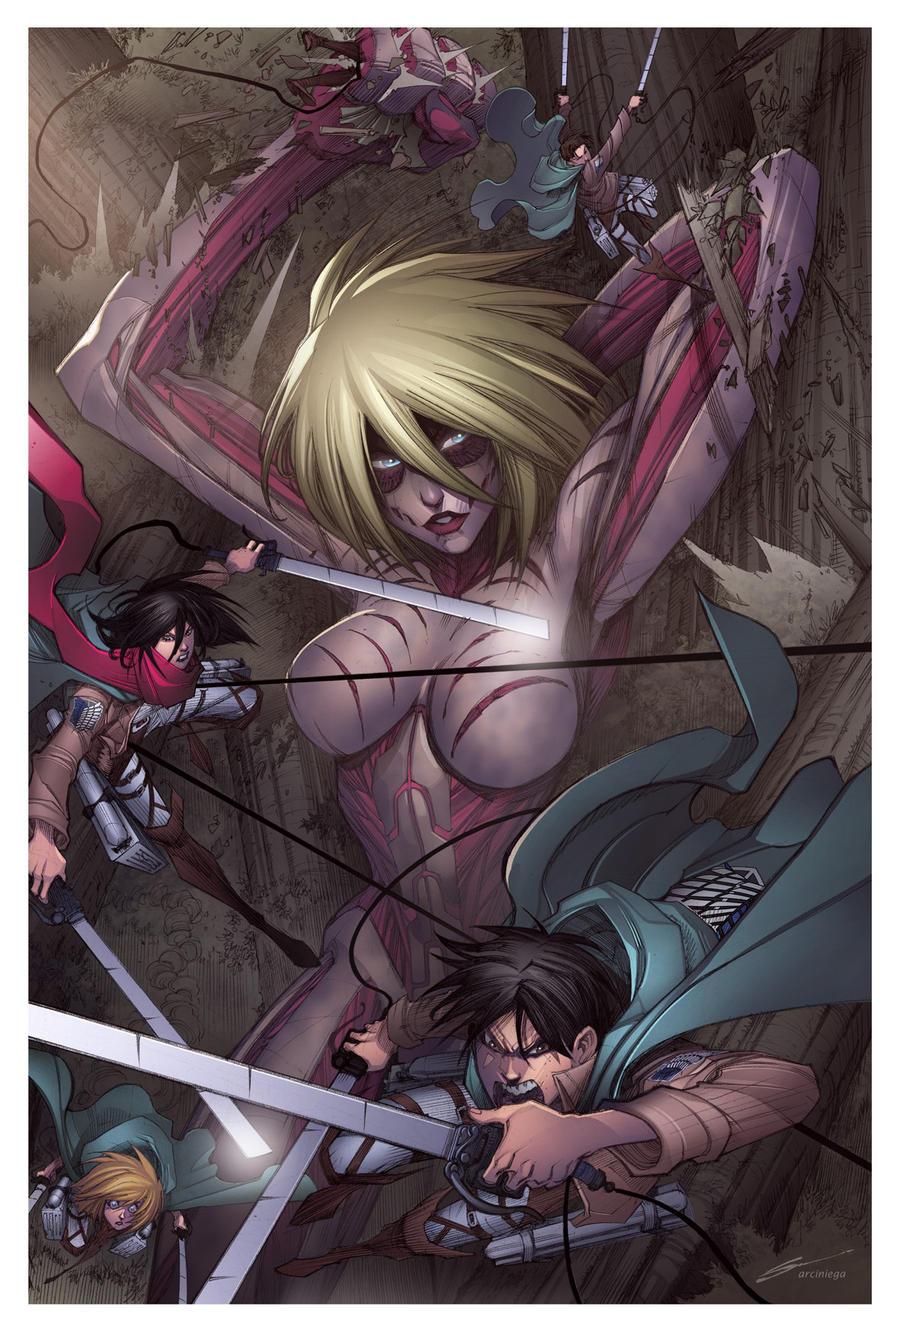 Attack On Titan - Female Titan Color by Sandoval-Art on DeviantArt